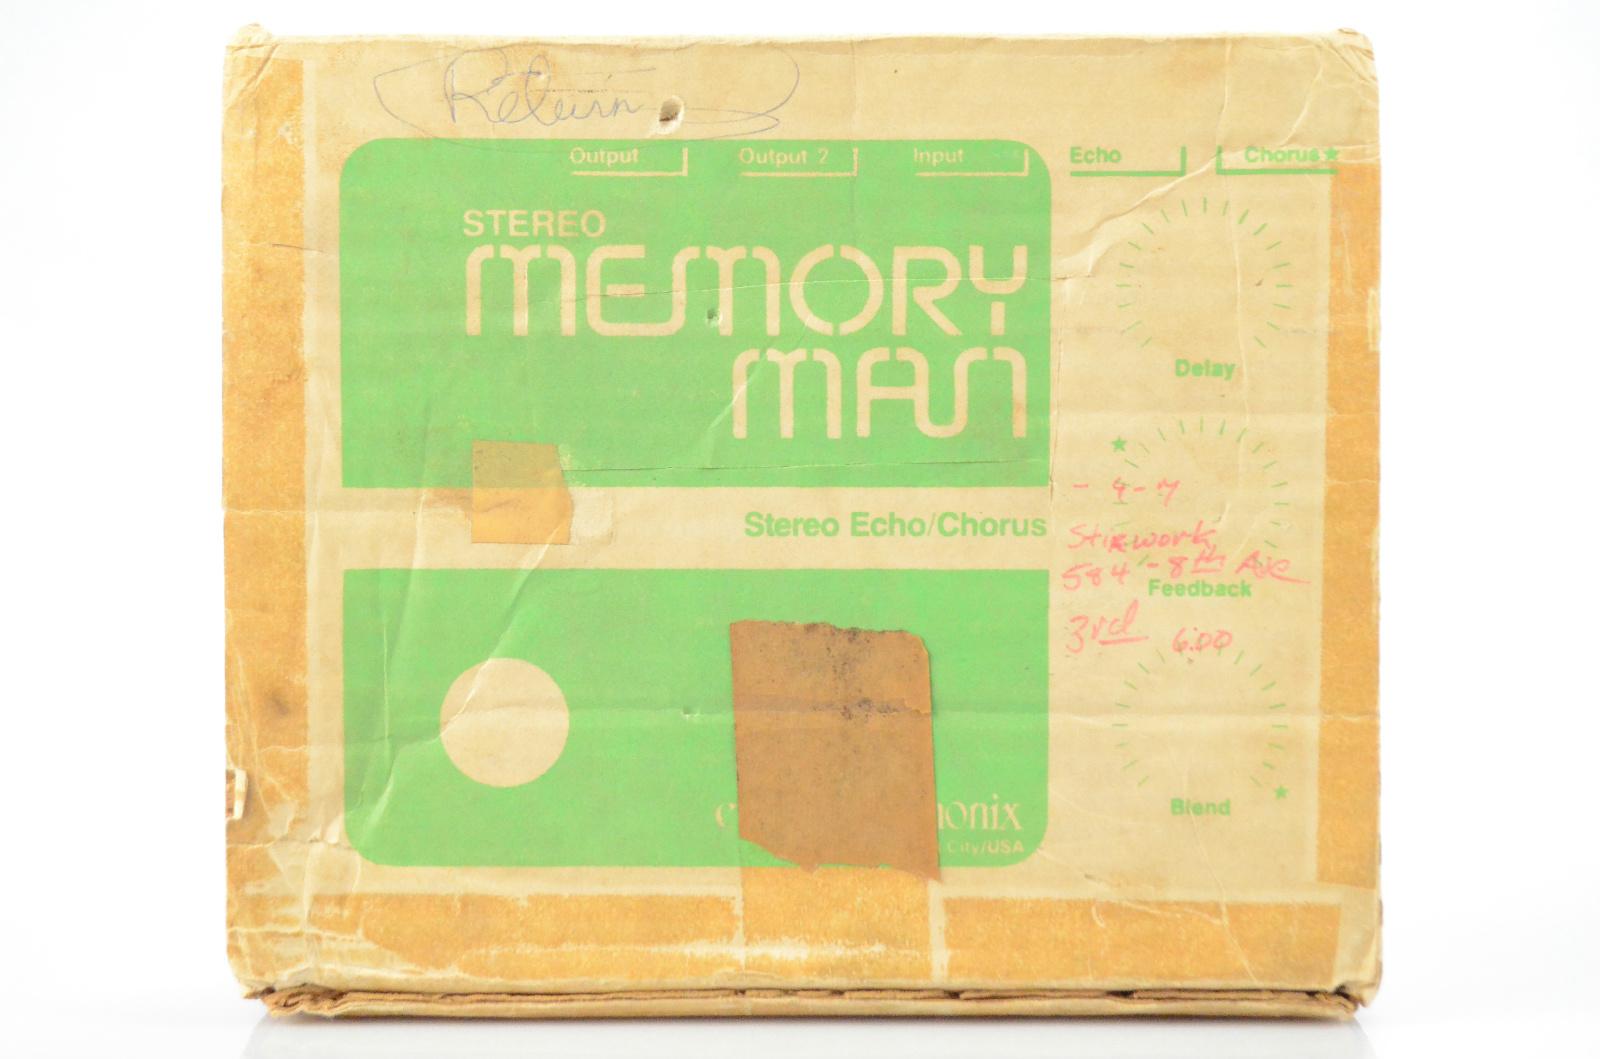 Electro-Harmonix EHX Vintage Stereo Memory Man Box & Instruction Manual #33133